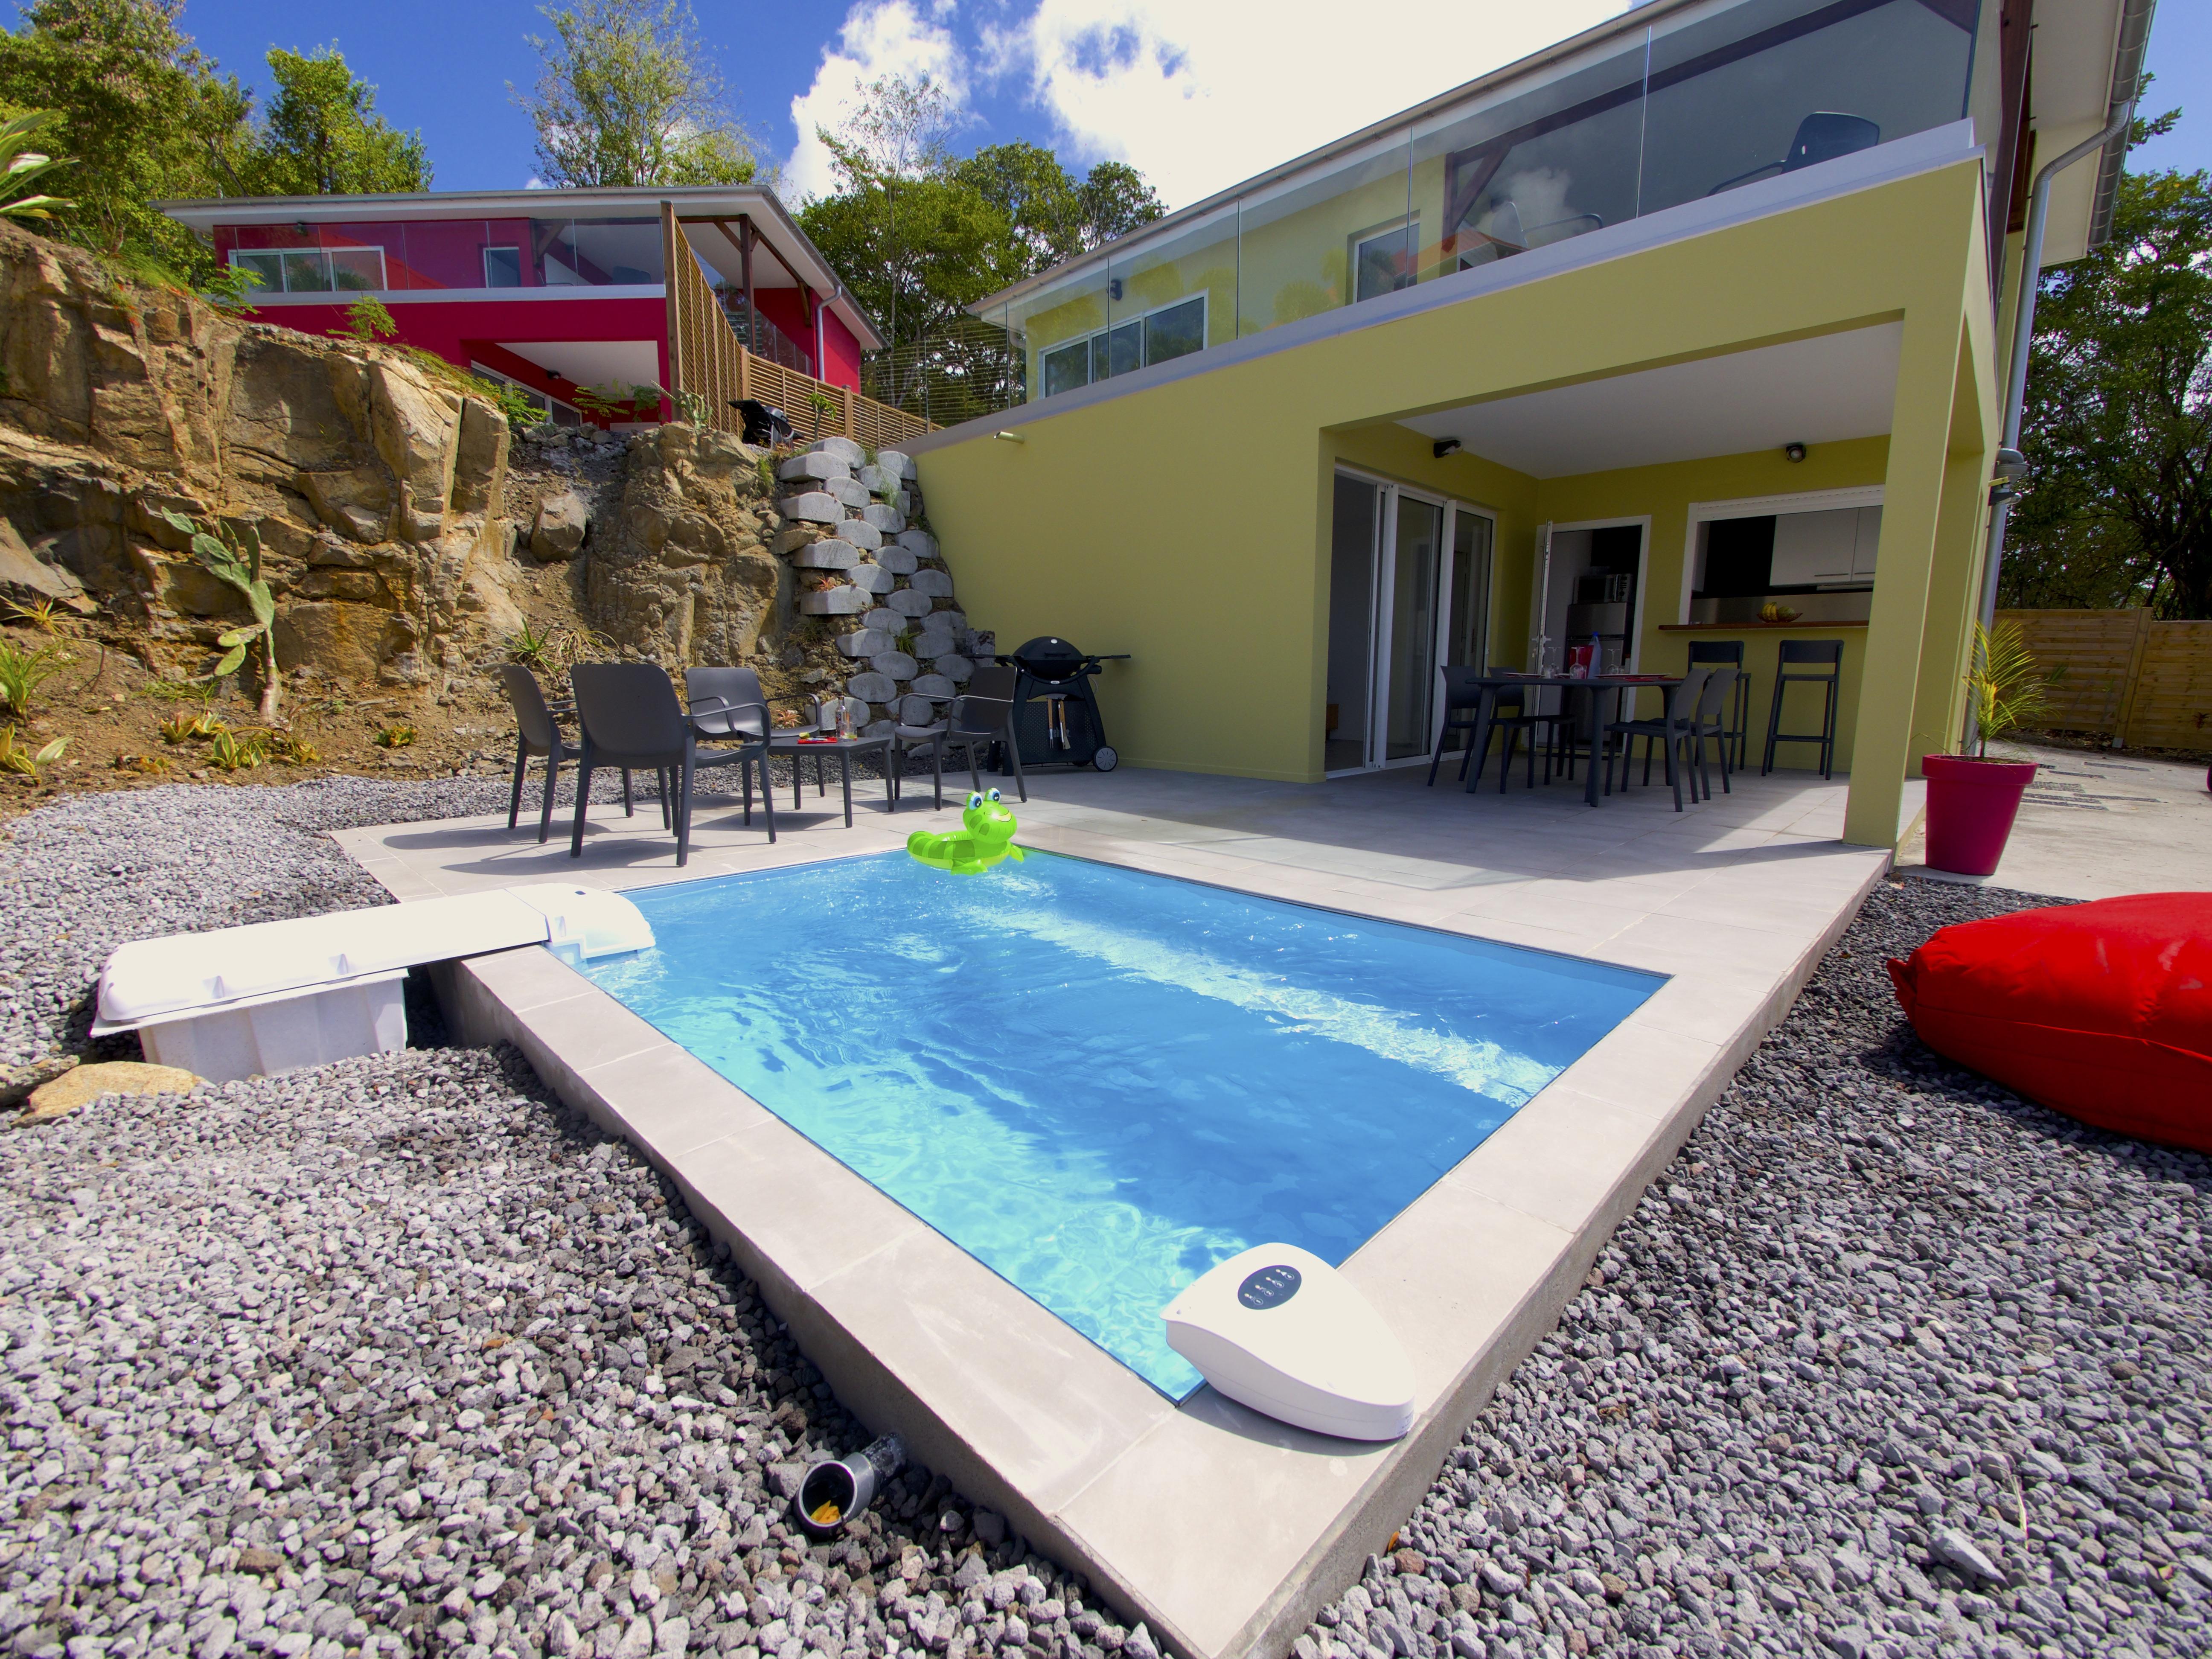 baylodge.fr piscine terrasse mamili